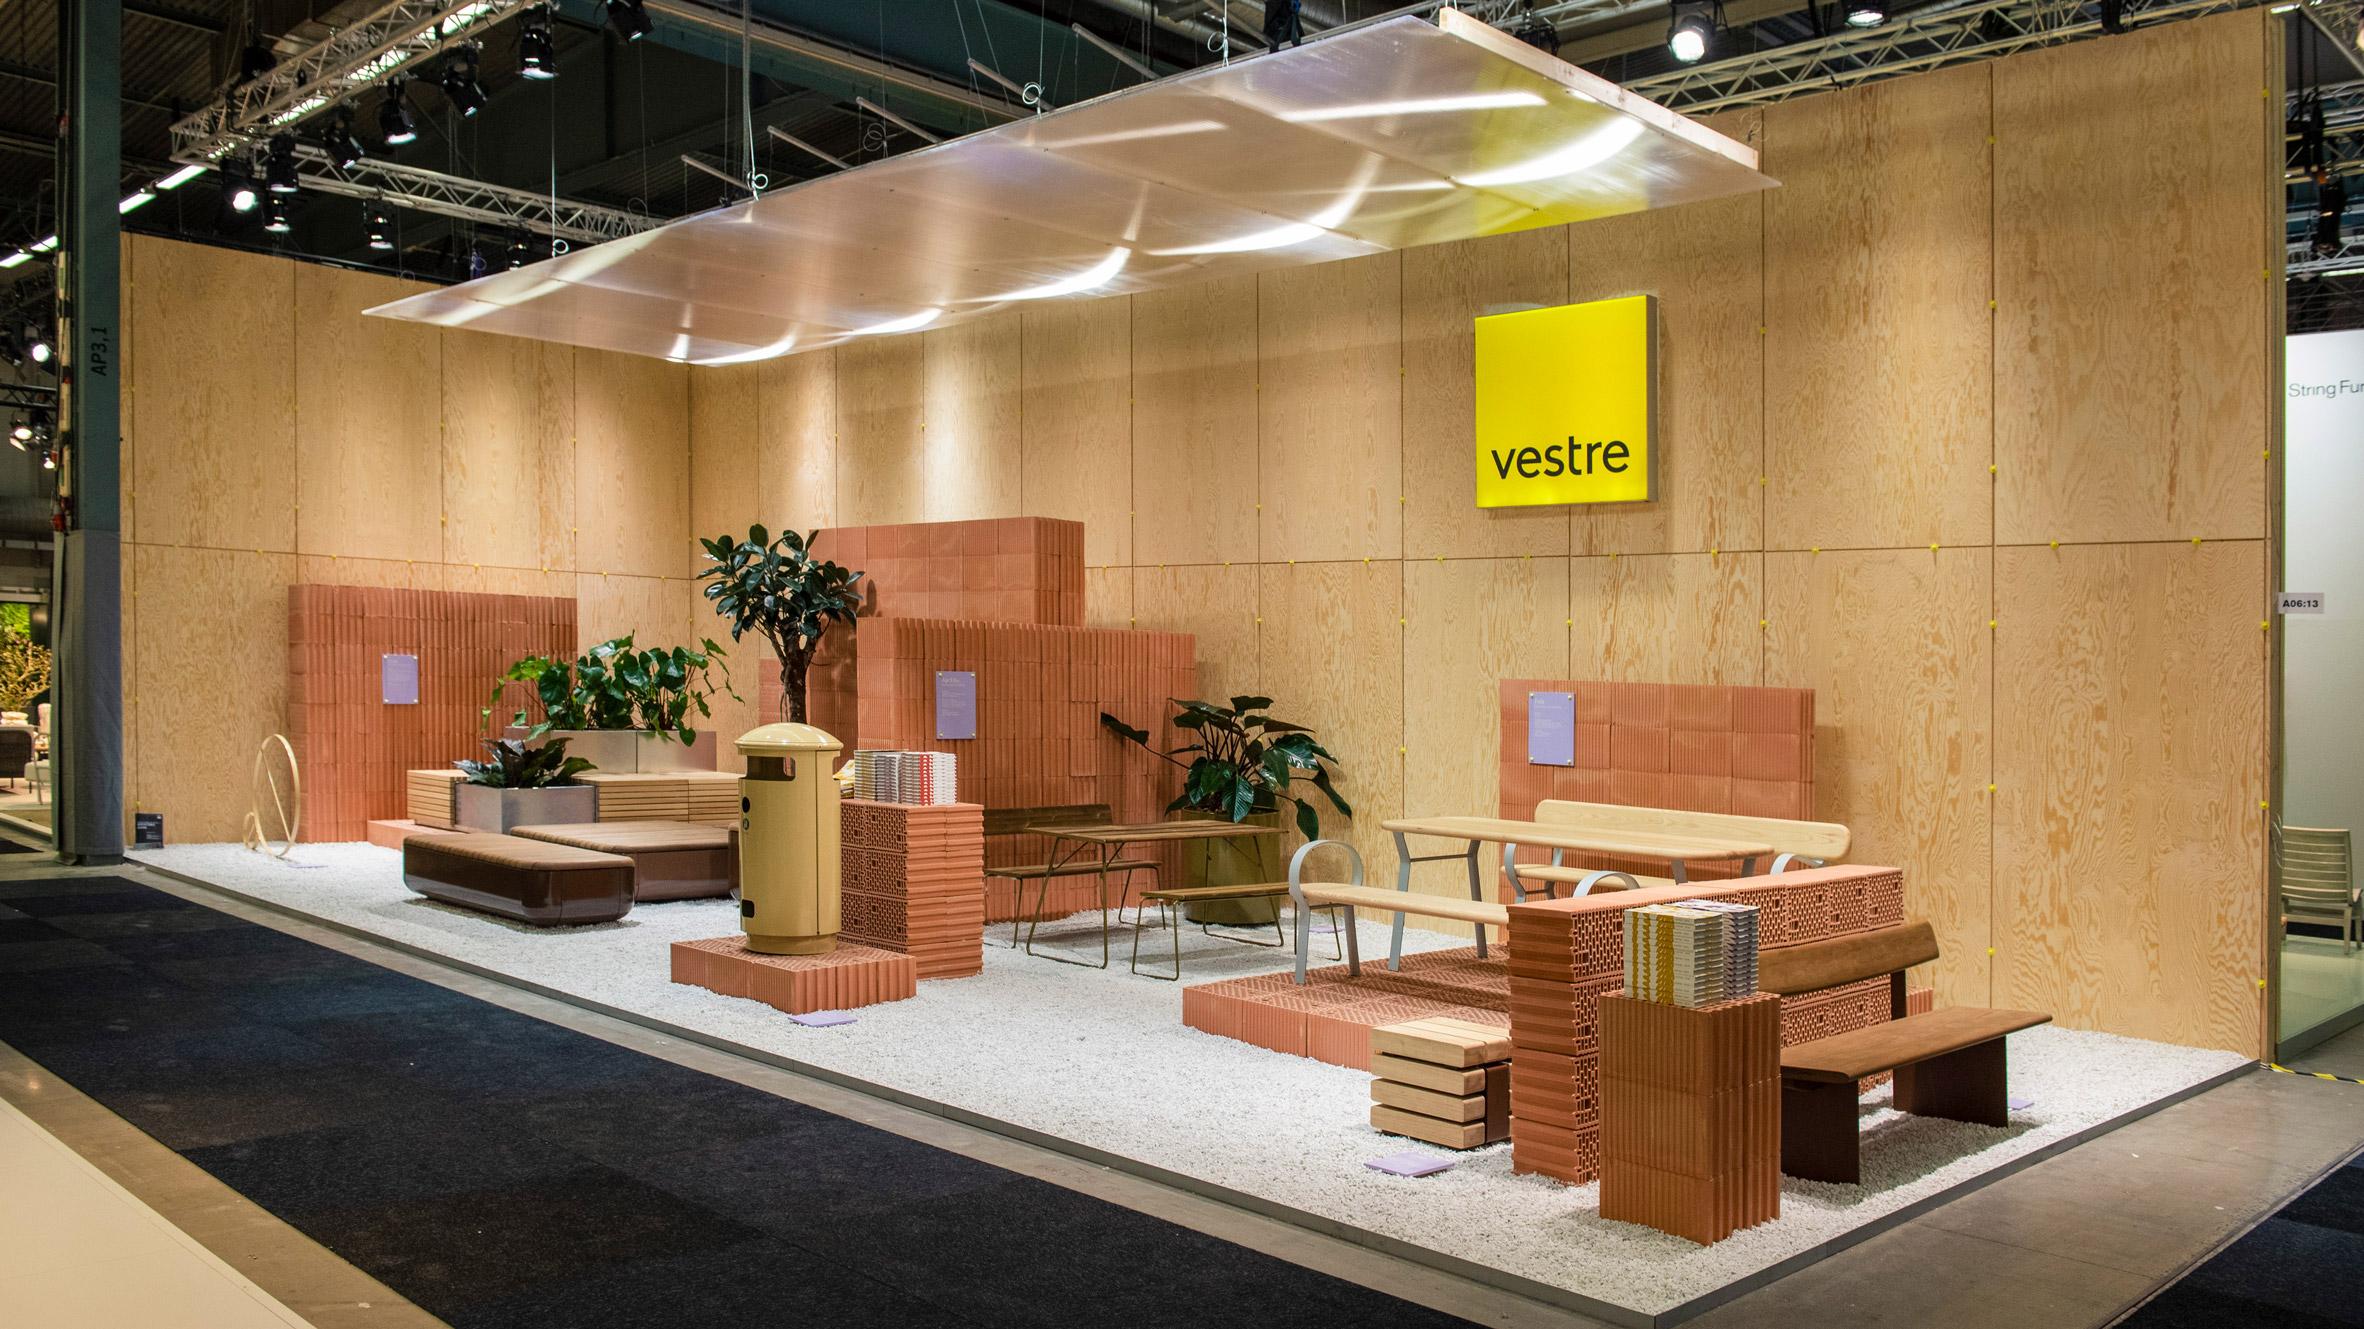 Vestre exhibition stand by Note Design Studio